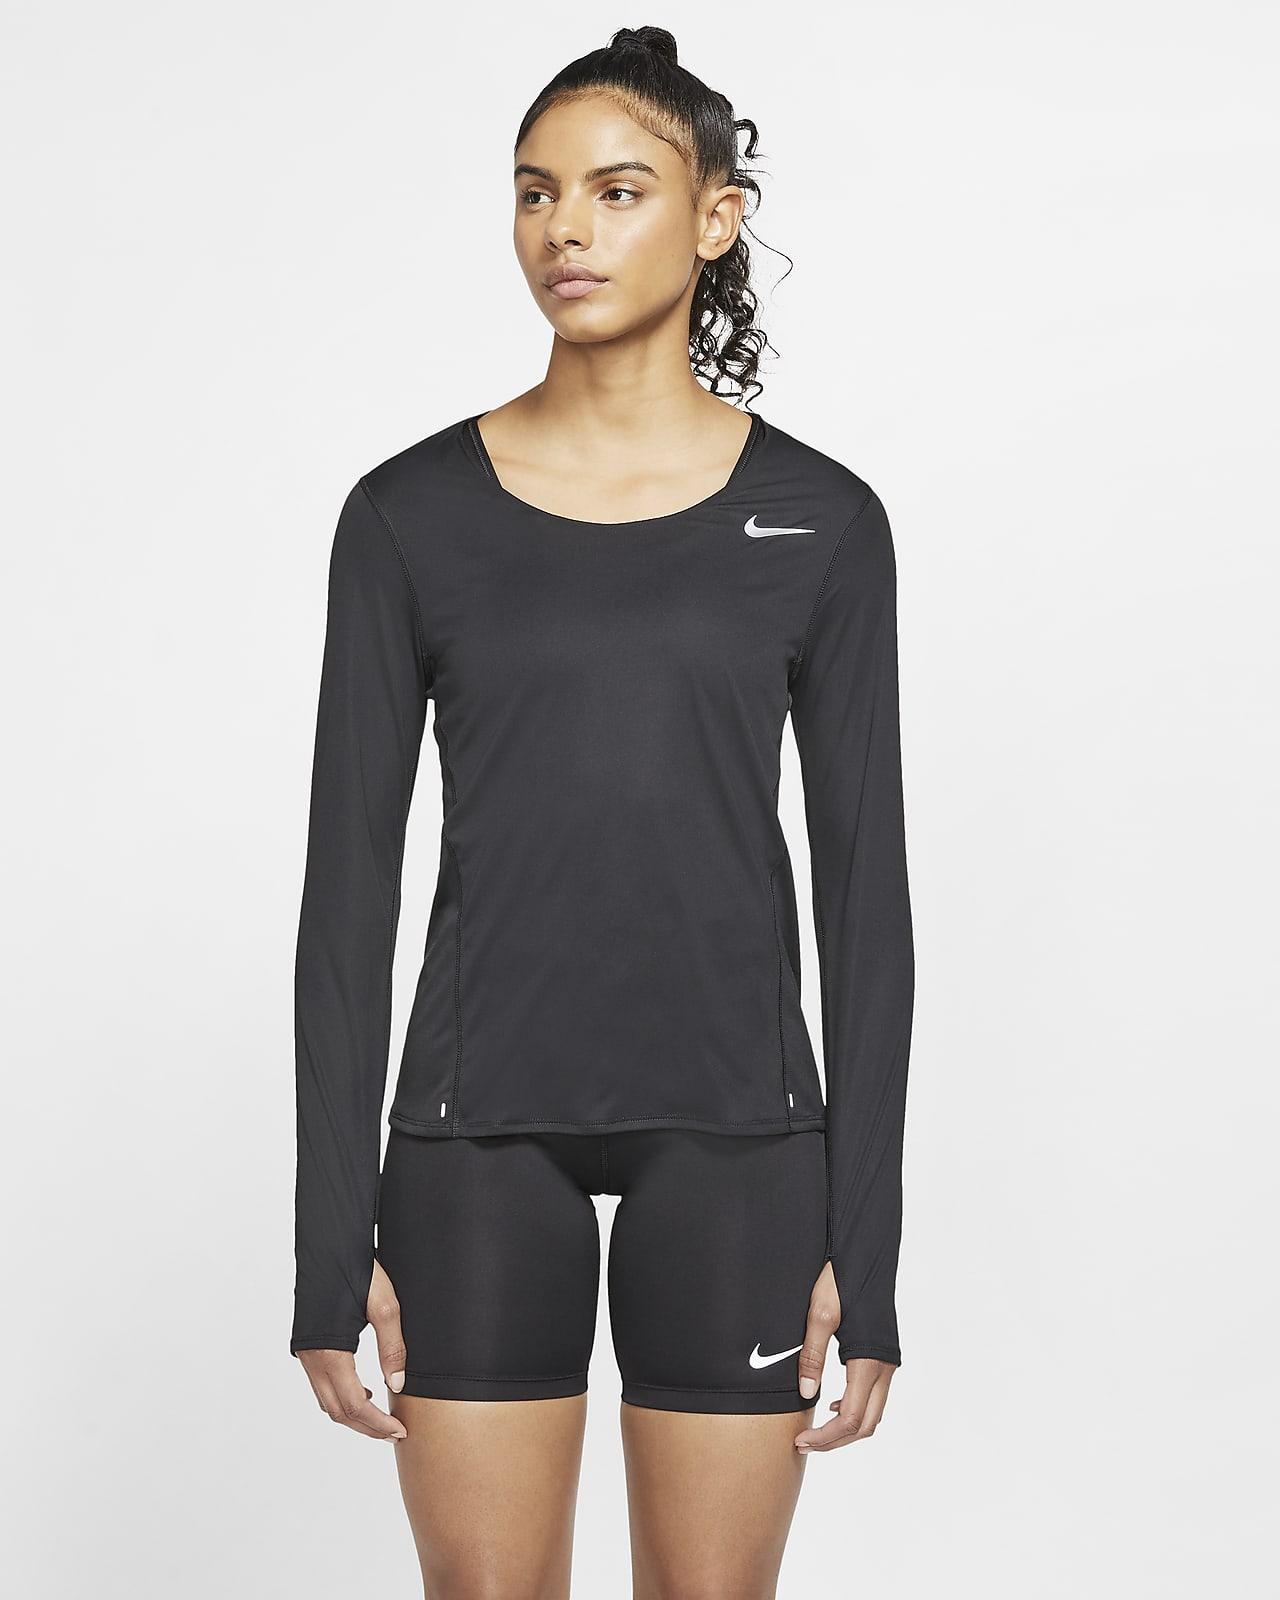 Long-Sleeve Running Top. Nike GB